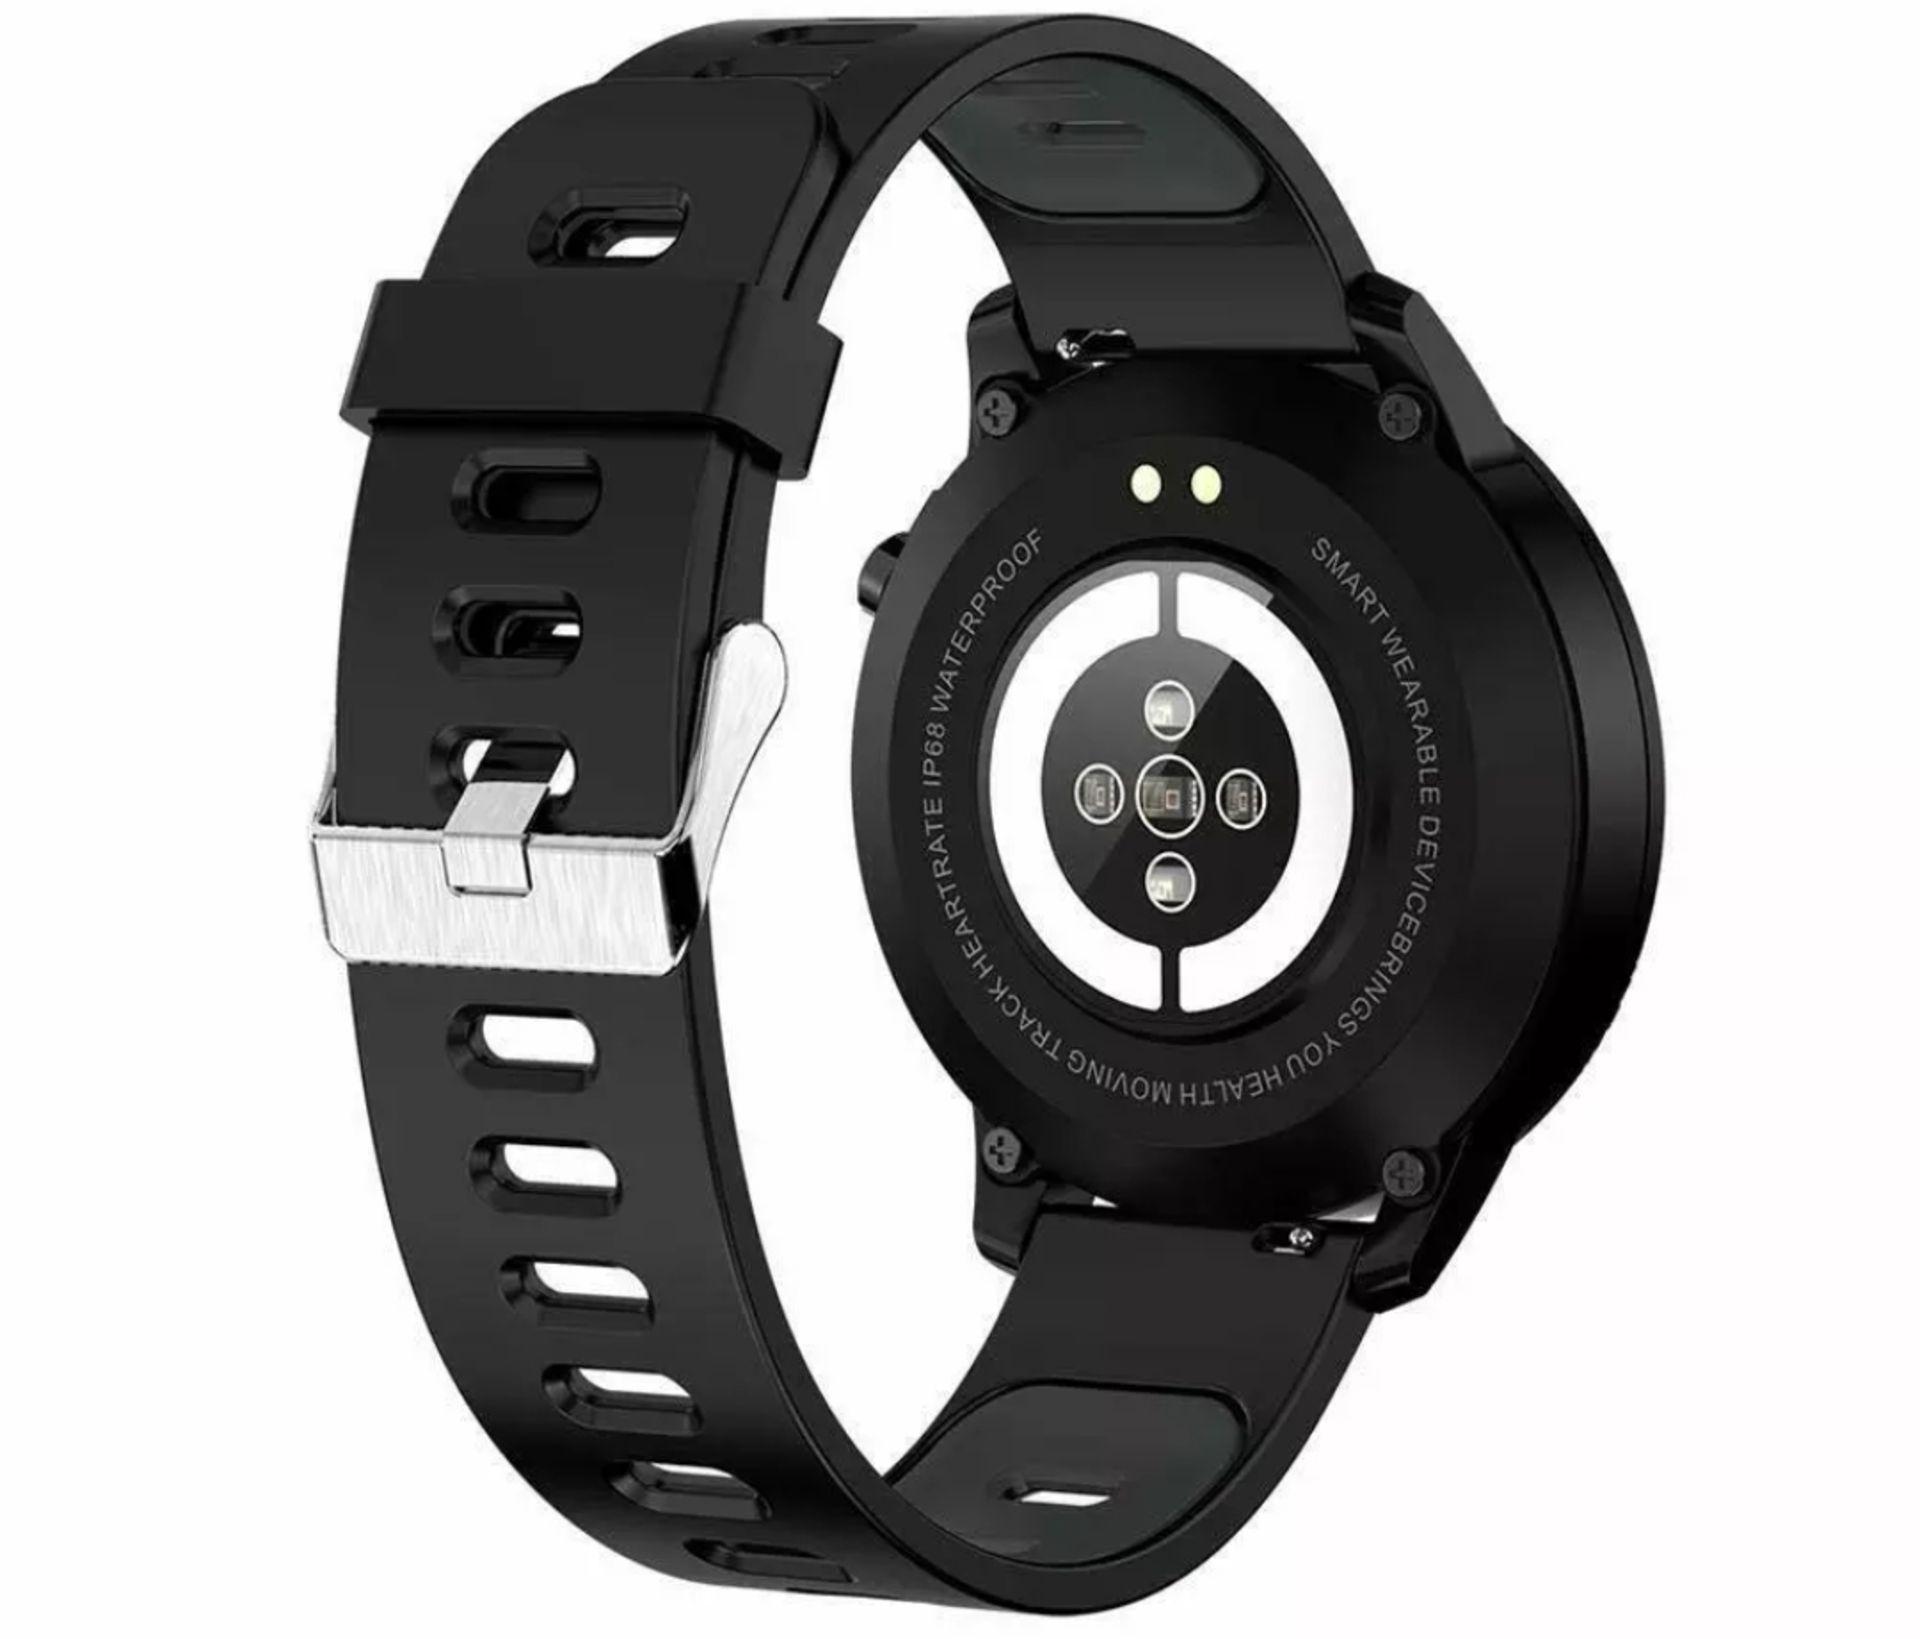 Lot 161 - L8 Smart Watch Blood Pressure Heart Rate Smart Bracelet Fitness Tracker, Red/ Black Strap